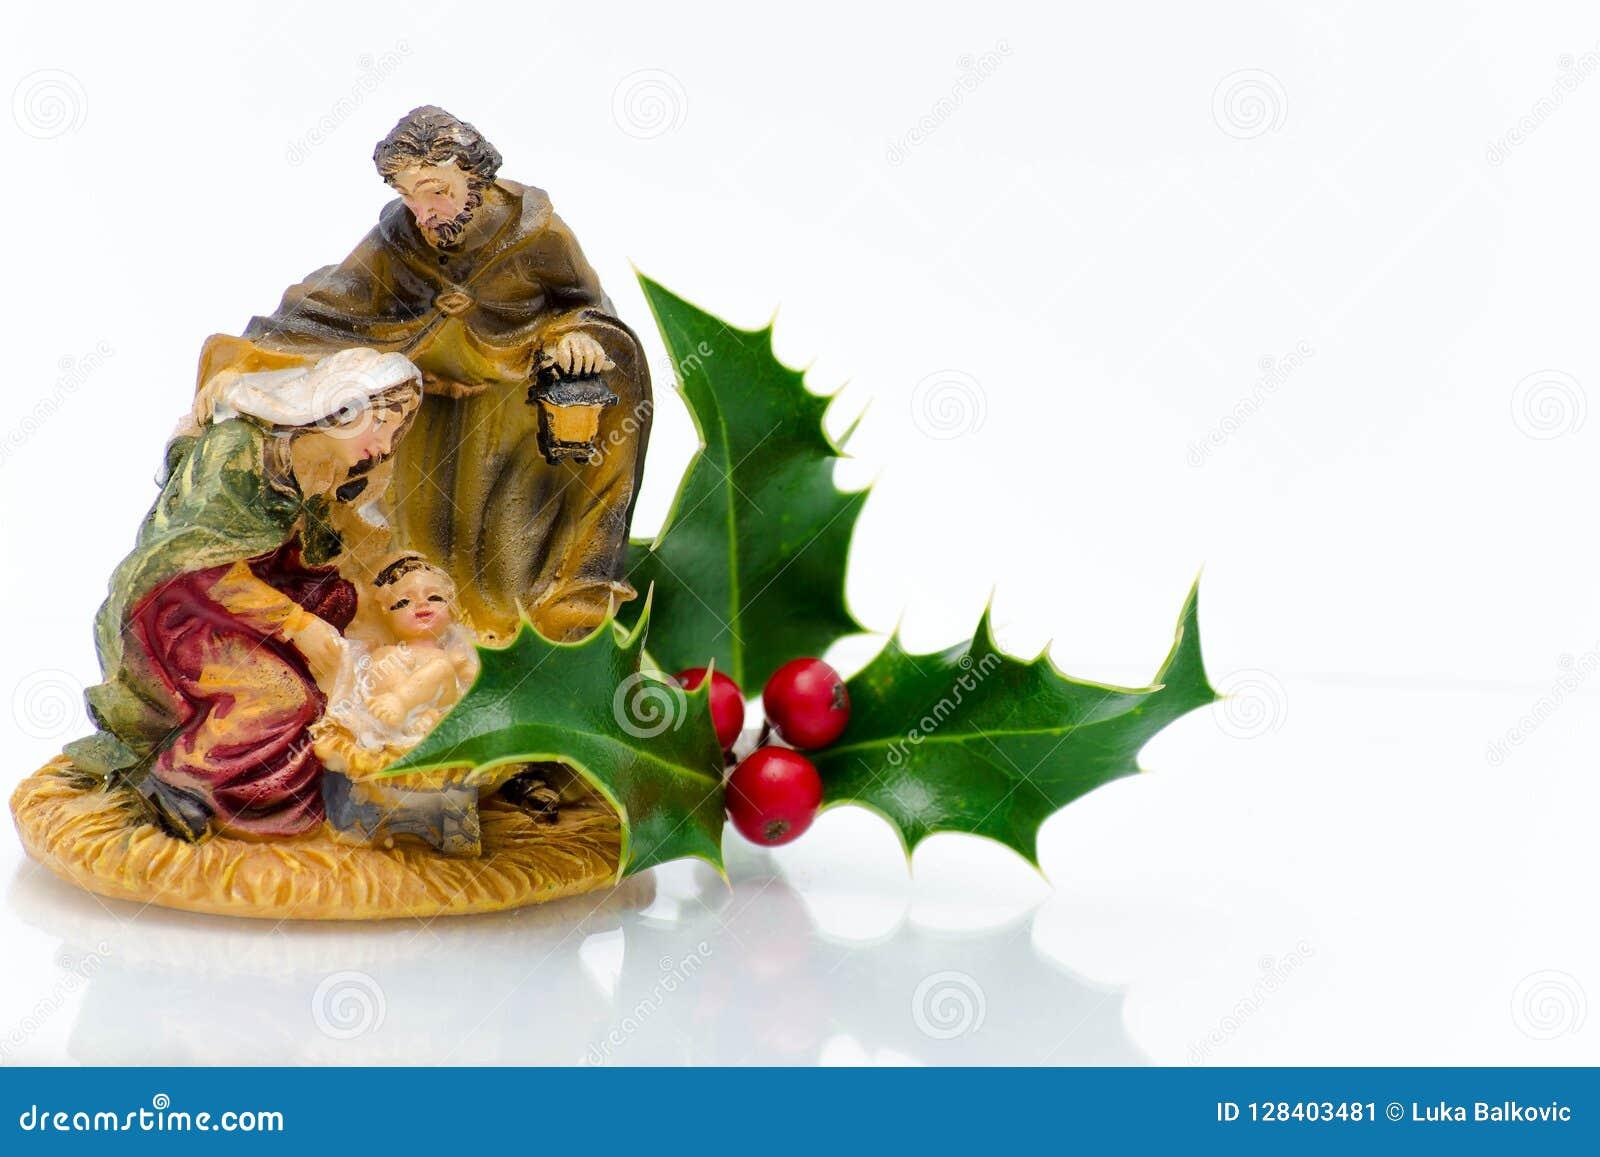 Christmas ornaments - holly family ornament